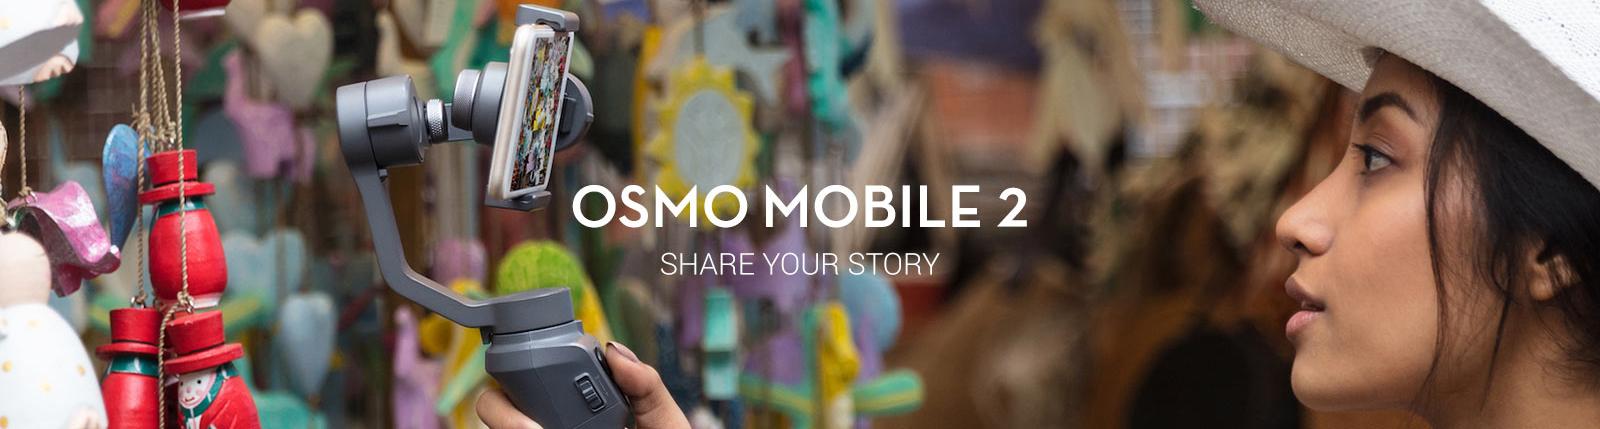 advertisement - DJI Osmo Mobile 2 - Guzel.com